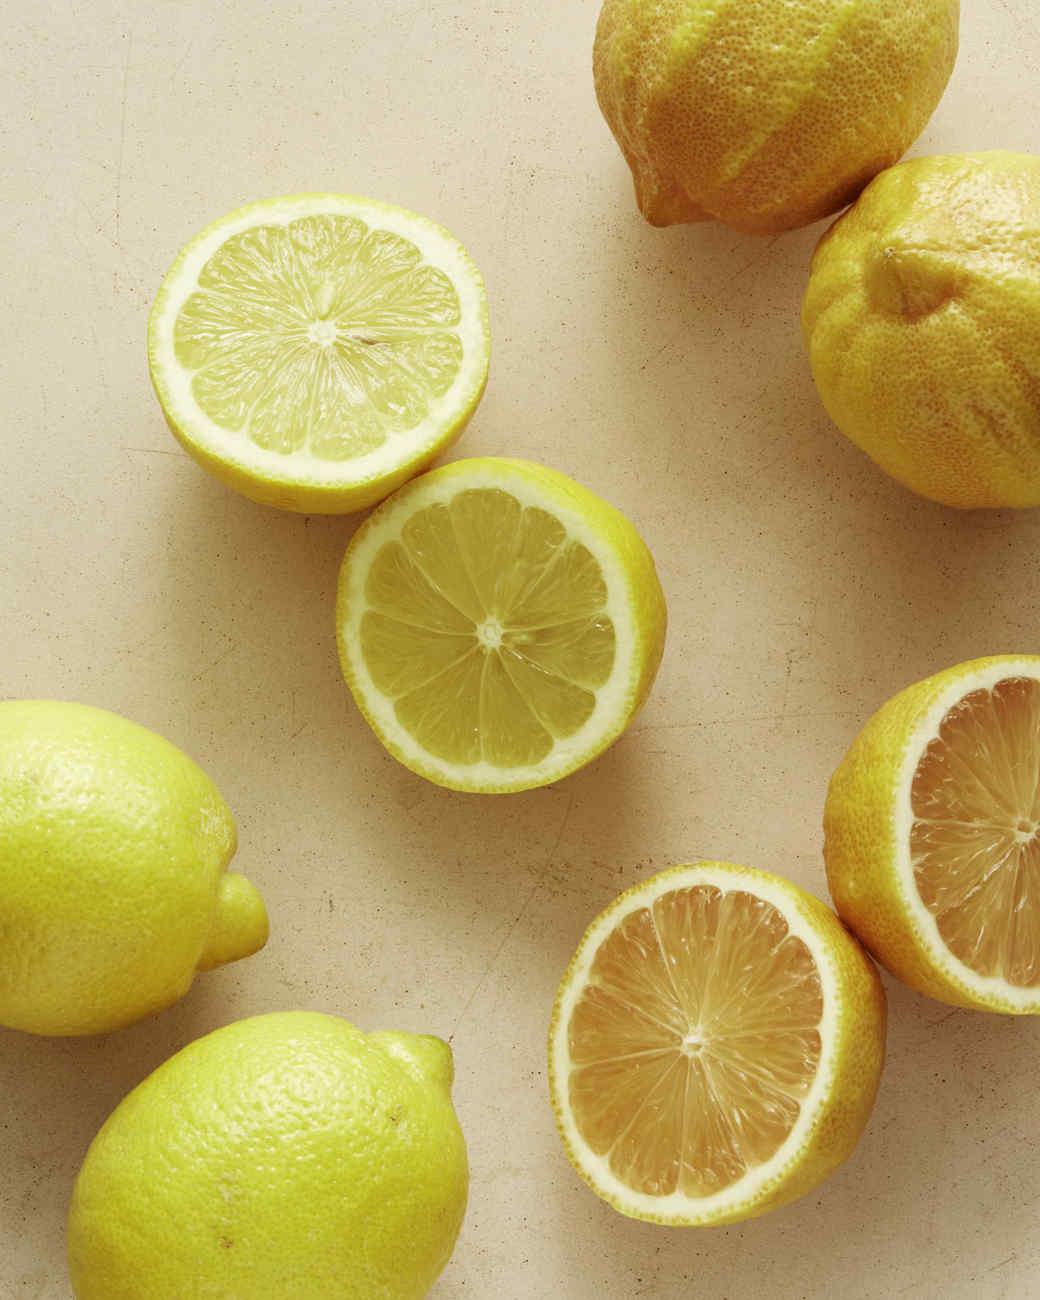 10 Recipes That Use Lemons